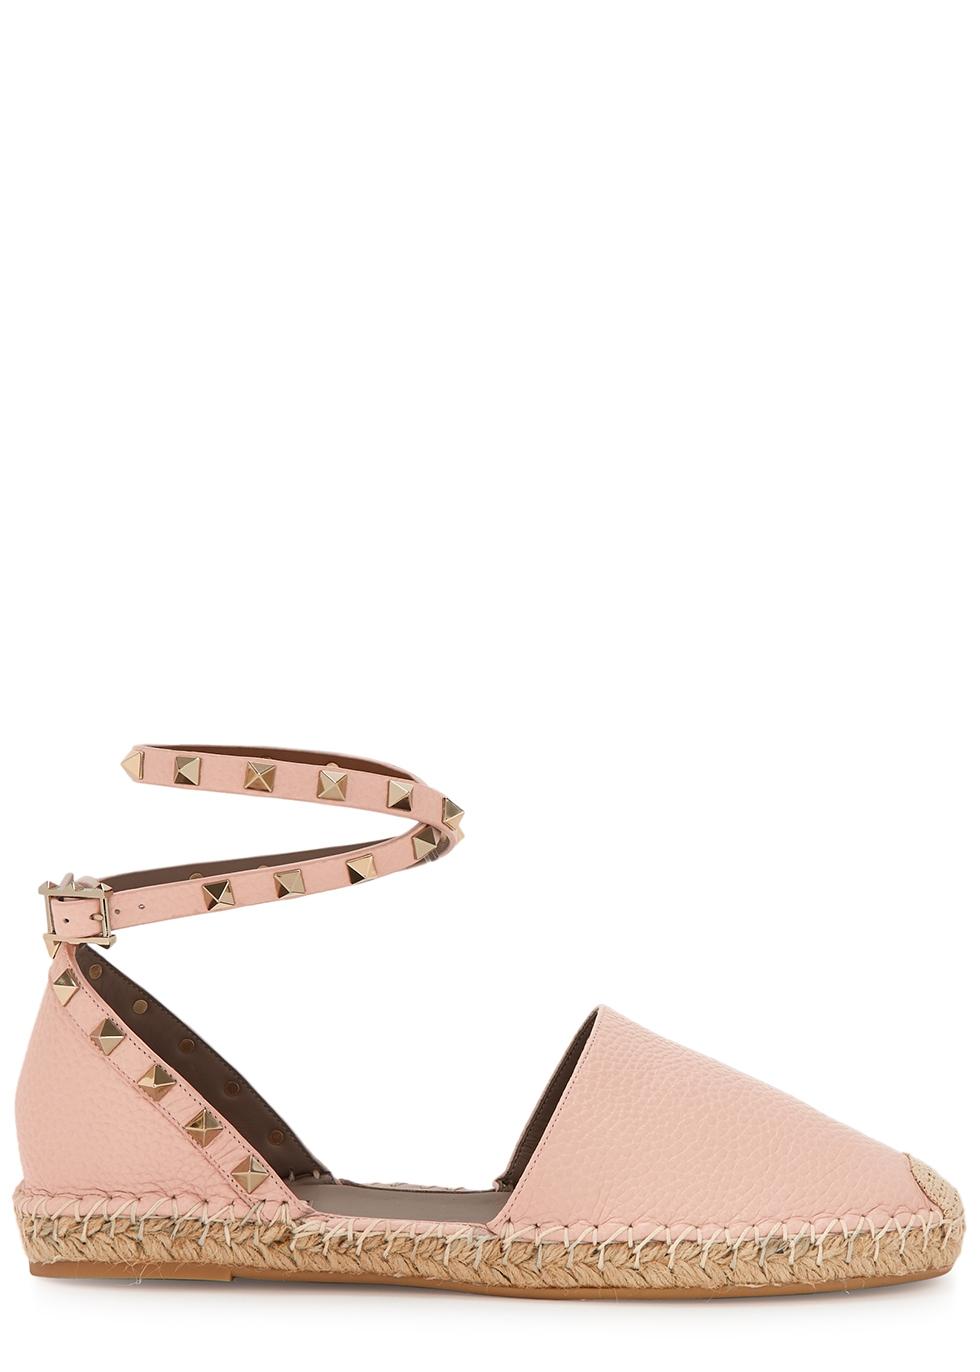 Valentino Garavani Rockstud pink leather espadrilles